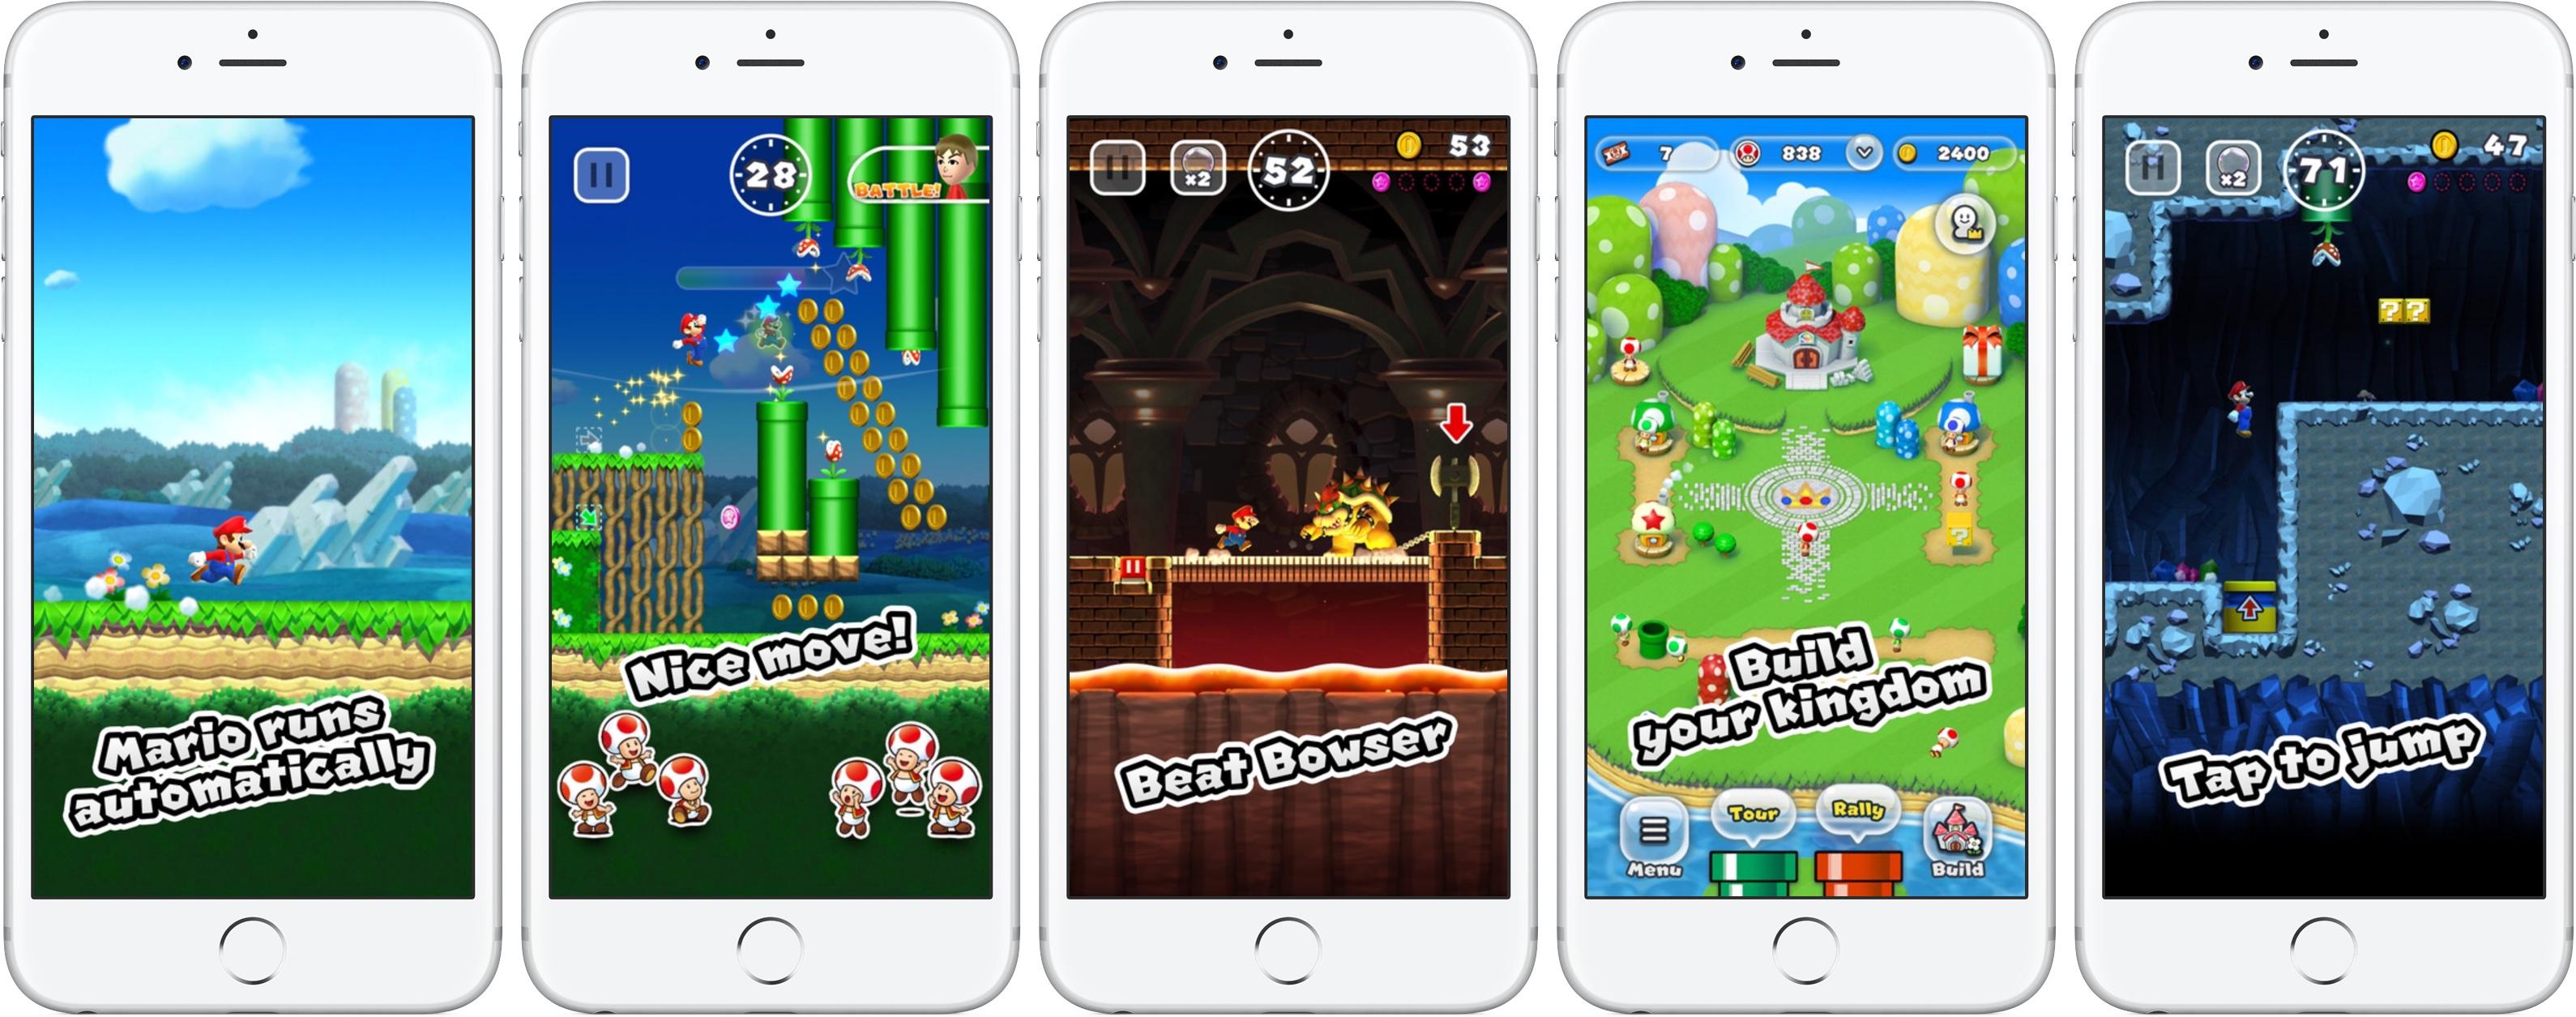 Super Mario Run for iOS iPhone screenshot 001